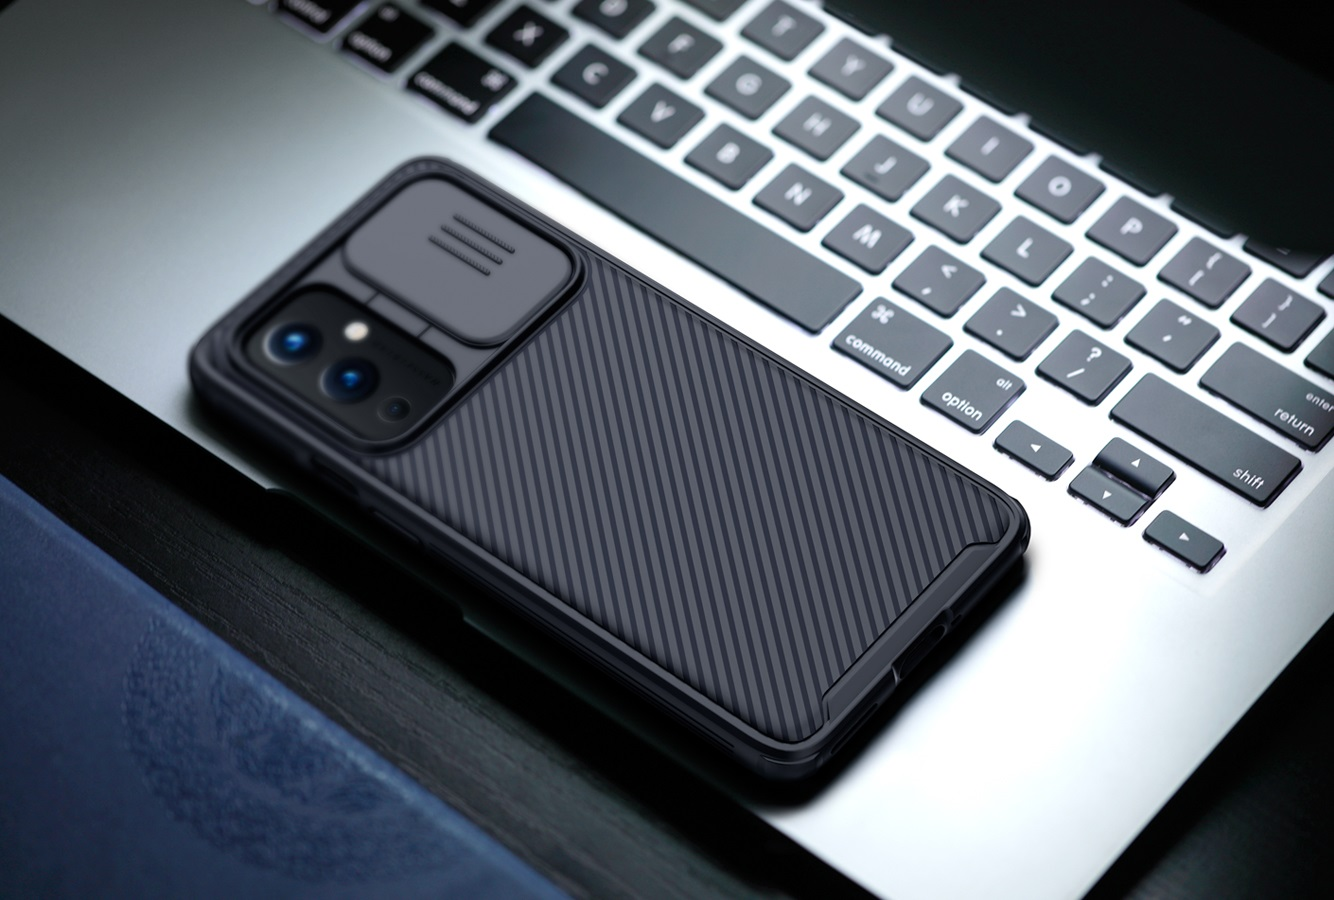 OnePlus_9_CamShield_Pro_Case-10.jpg